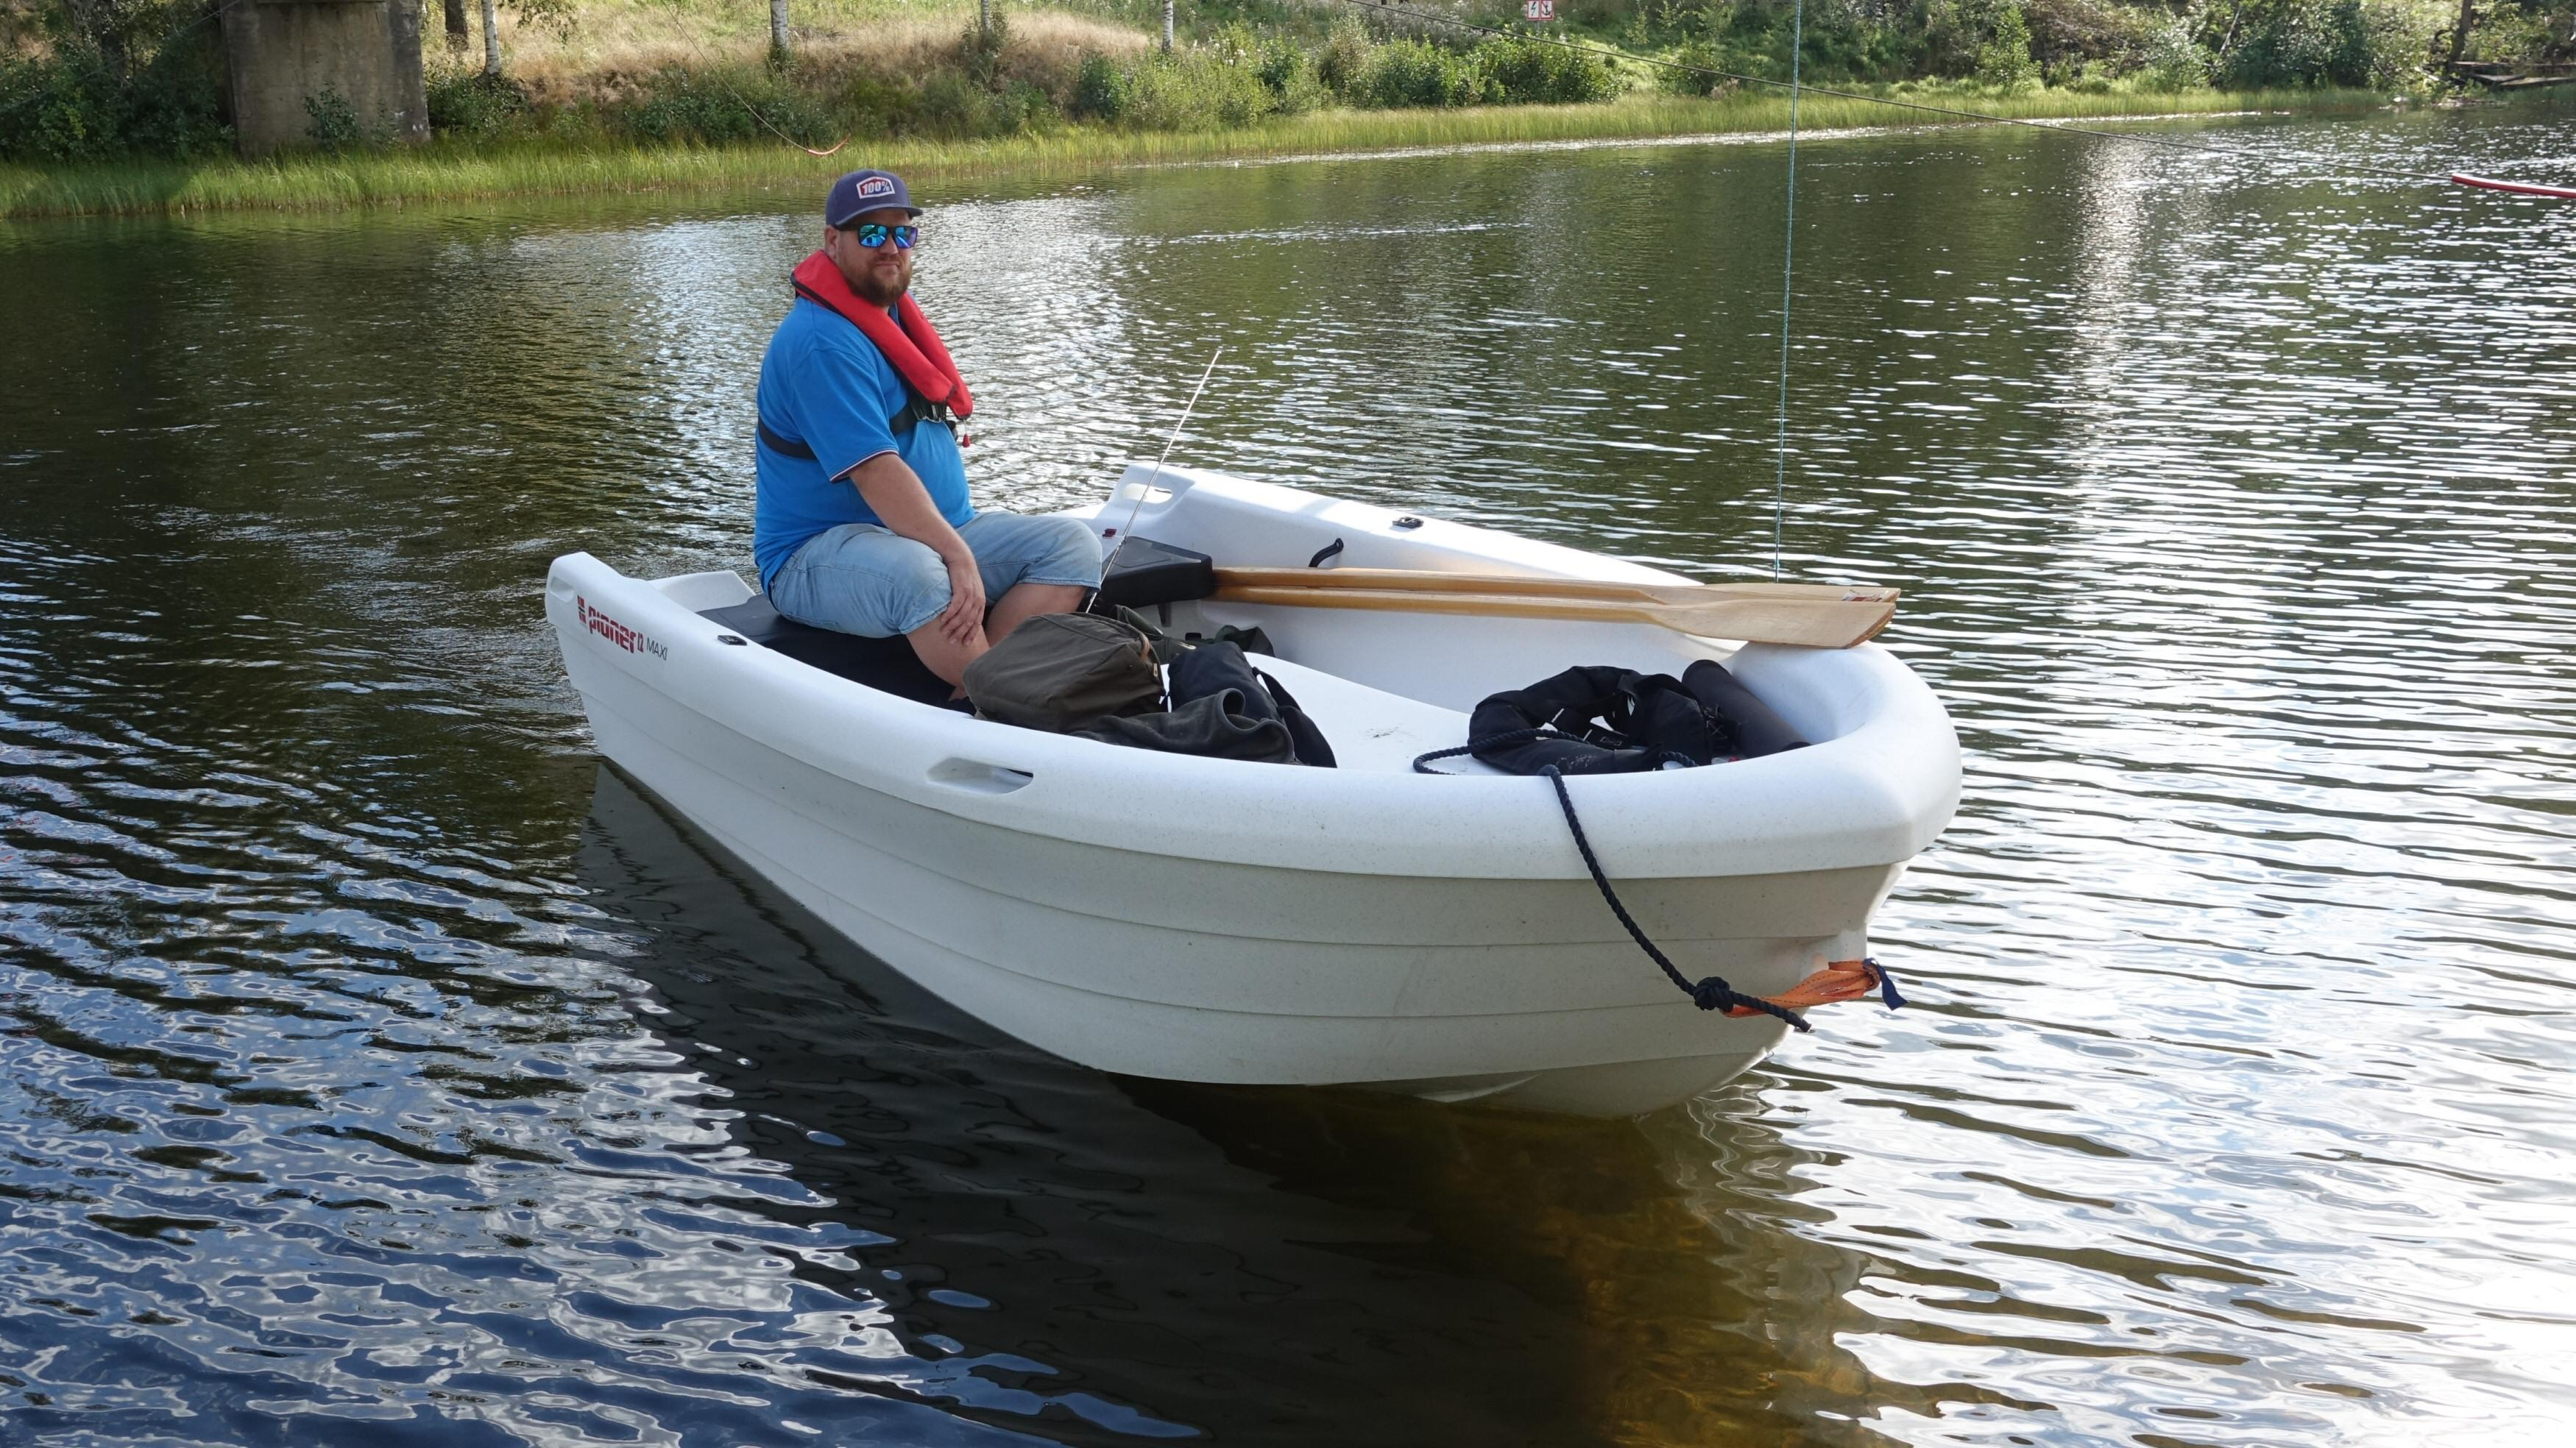 Vi tester Pioners elektriske båt